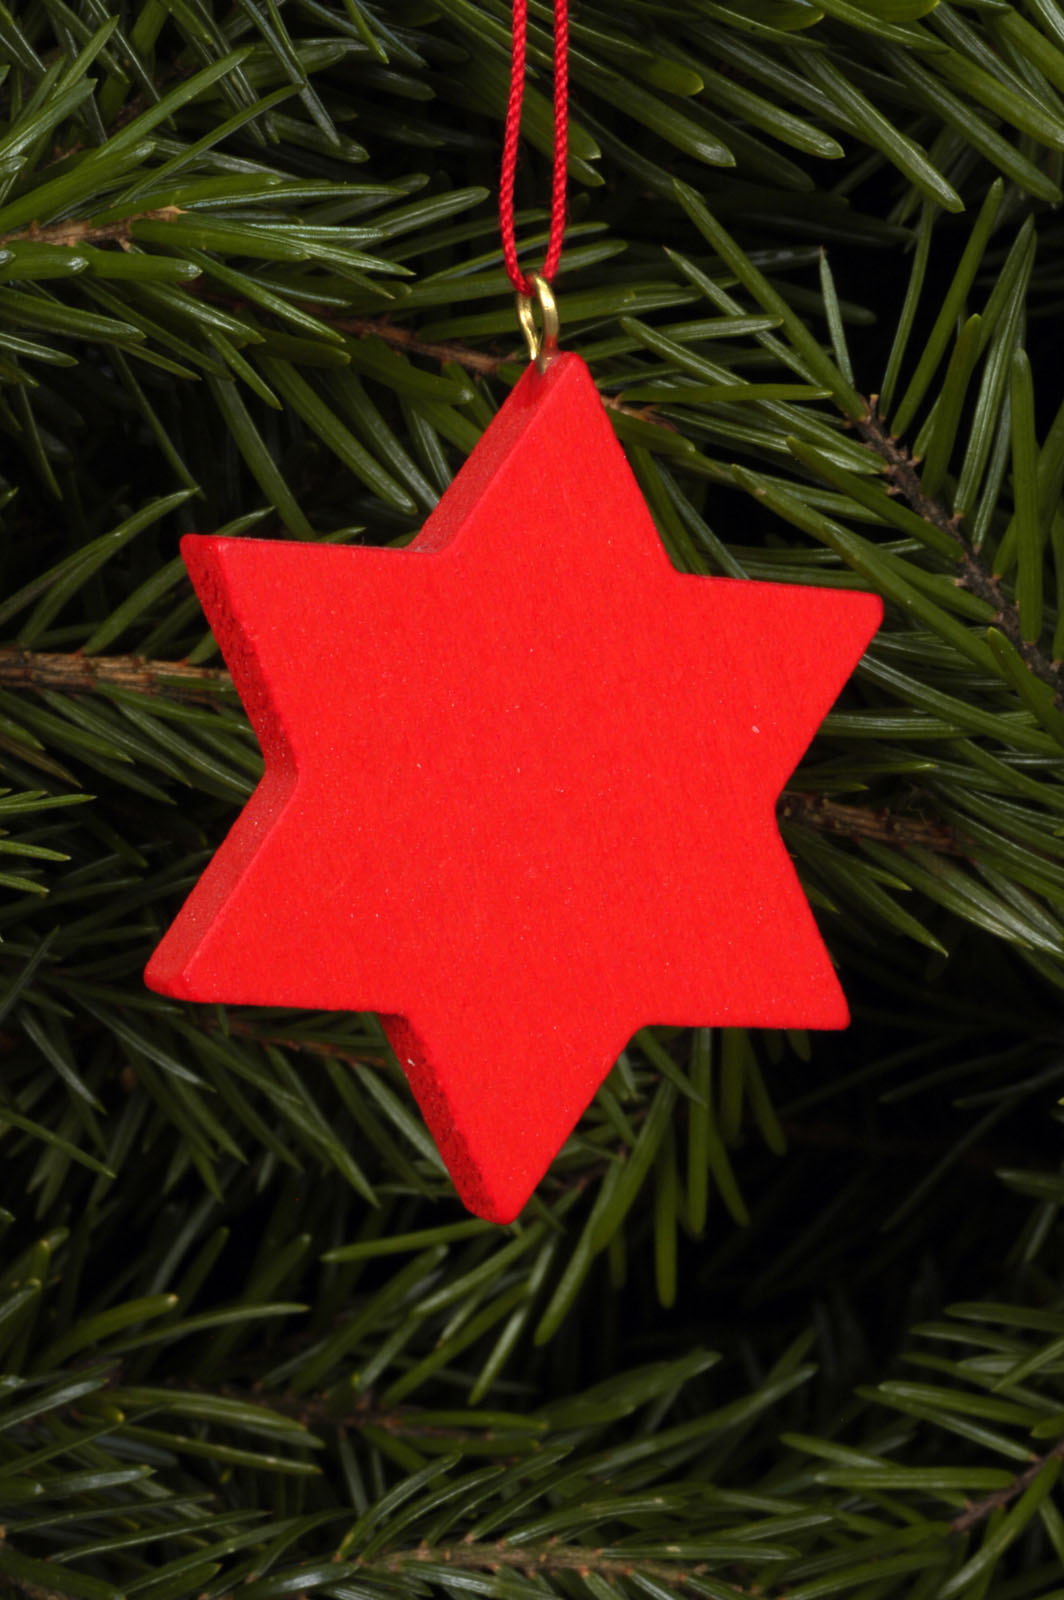 Baumbehang roter Stern